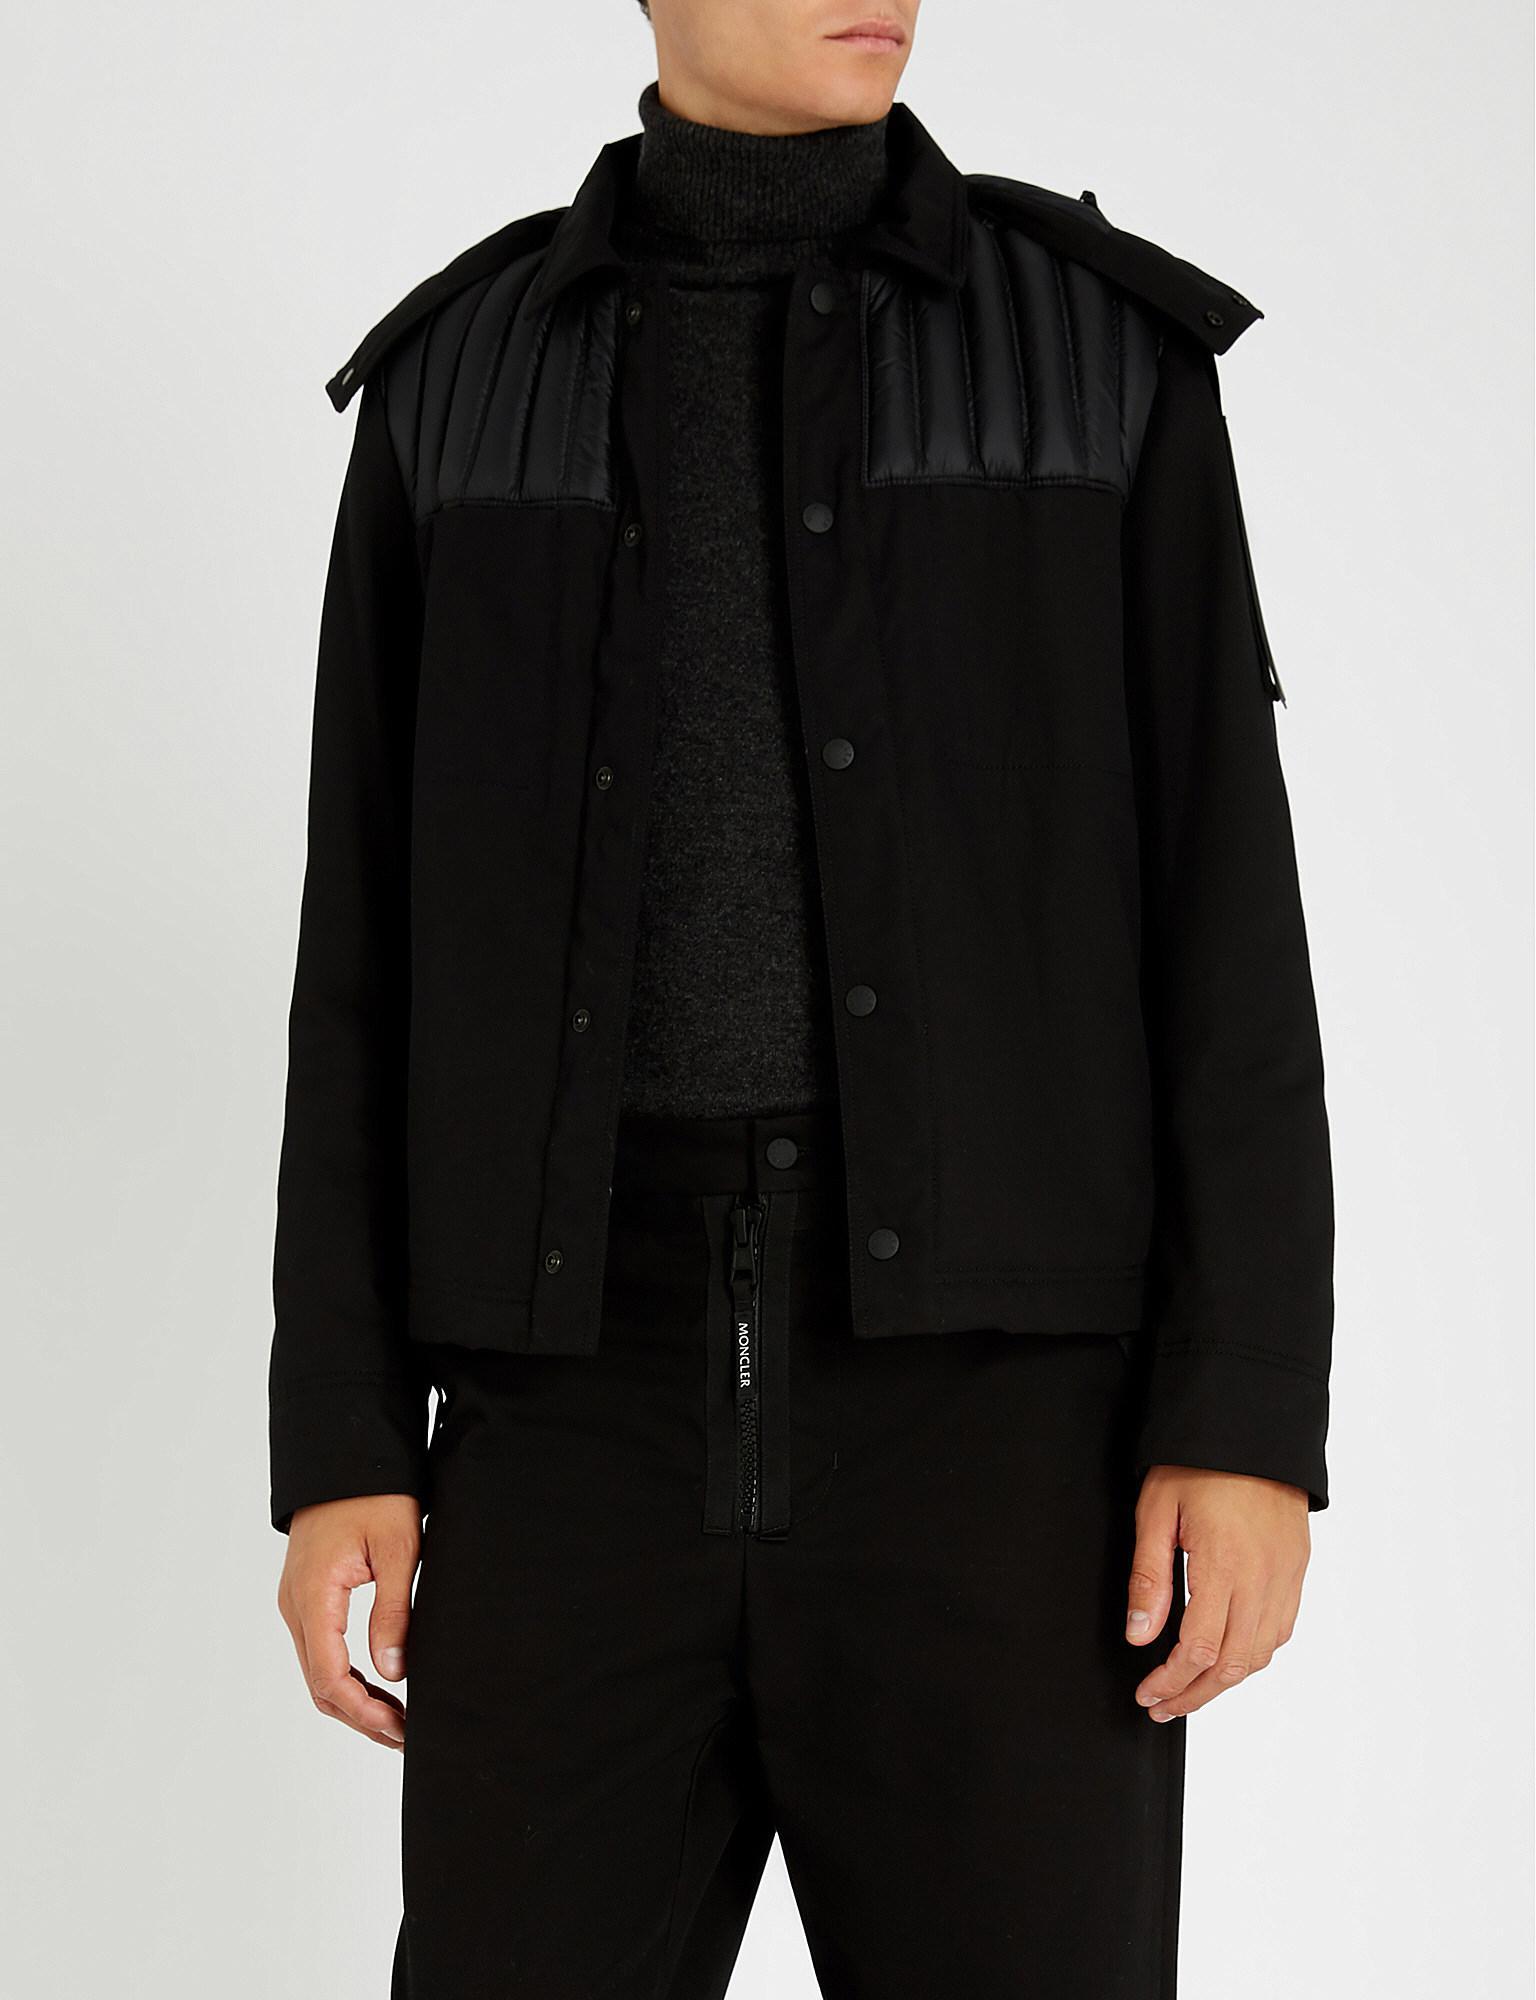 30990ba434c0 Moncler 5 Craig Green Cotton-canvas Jacket in Black for Men - Lyst